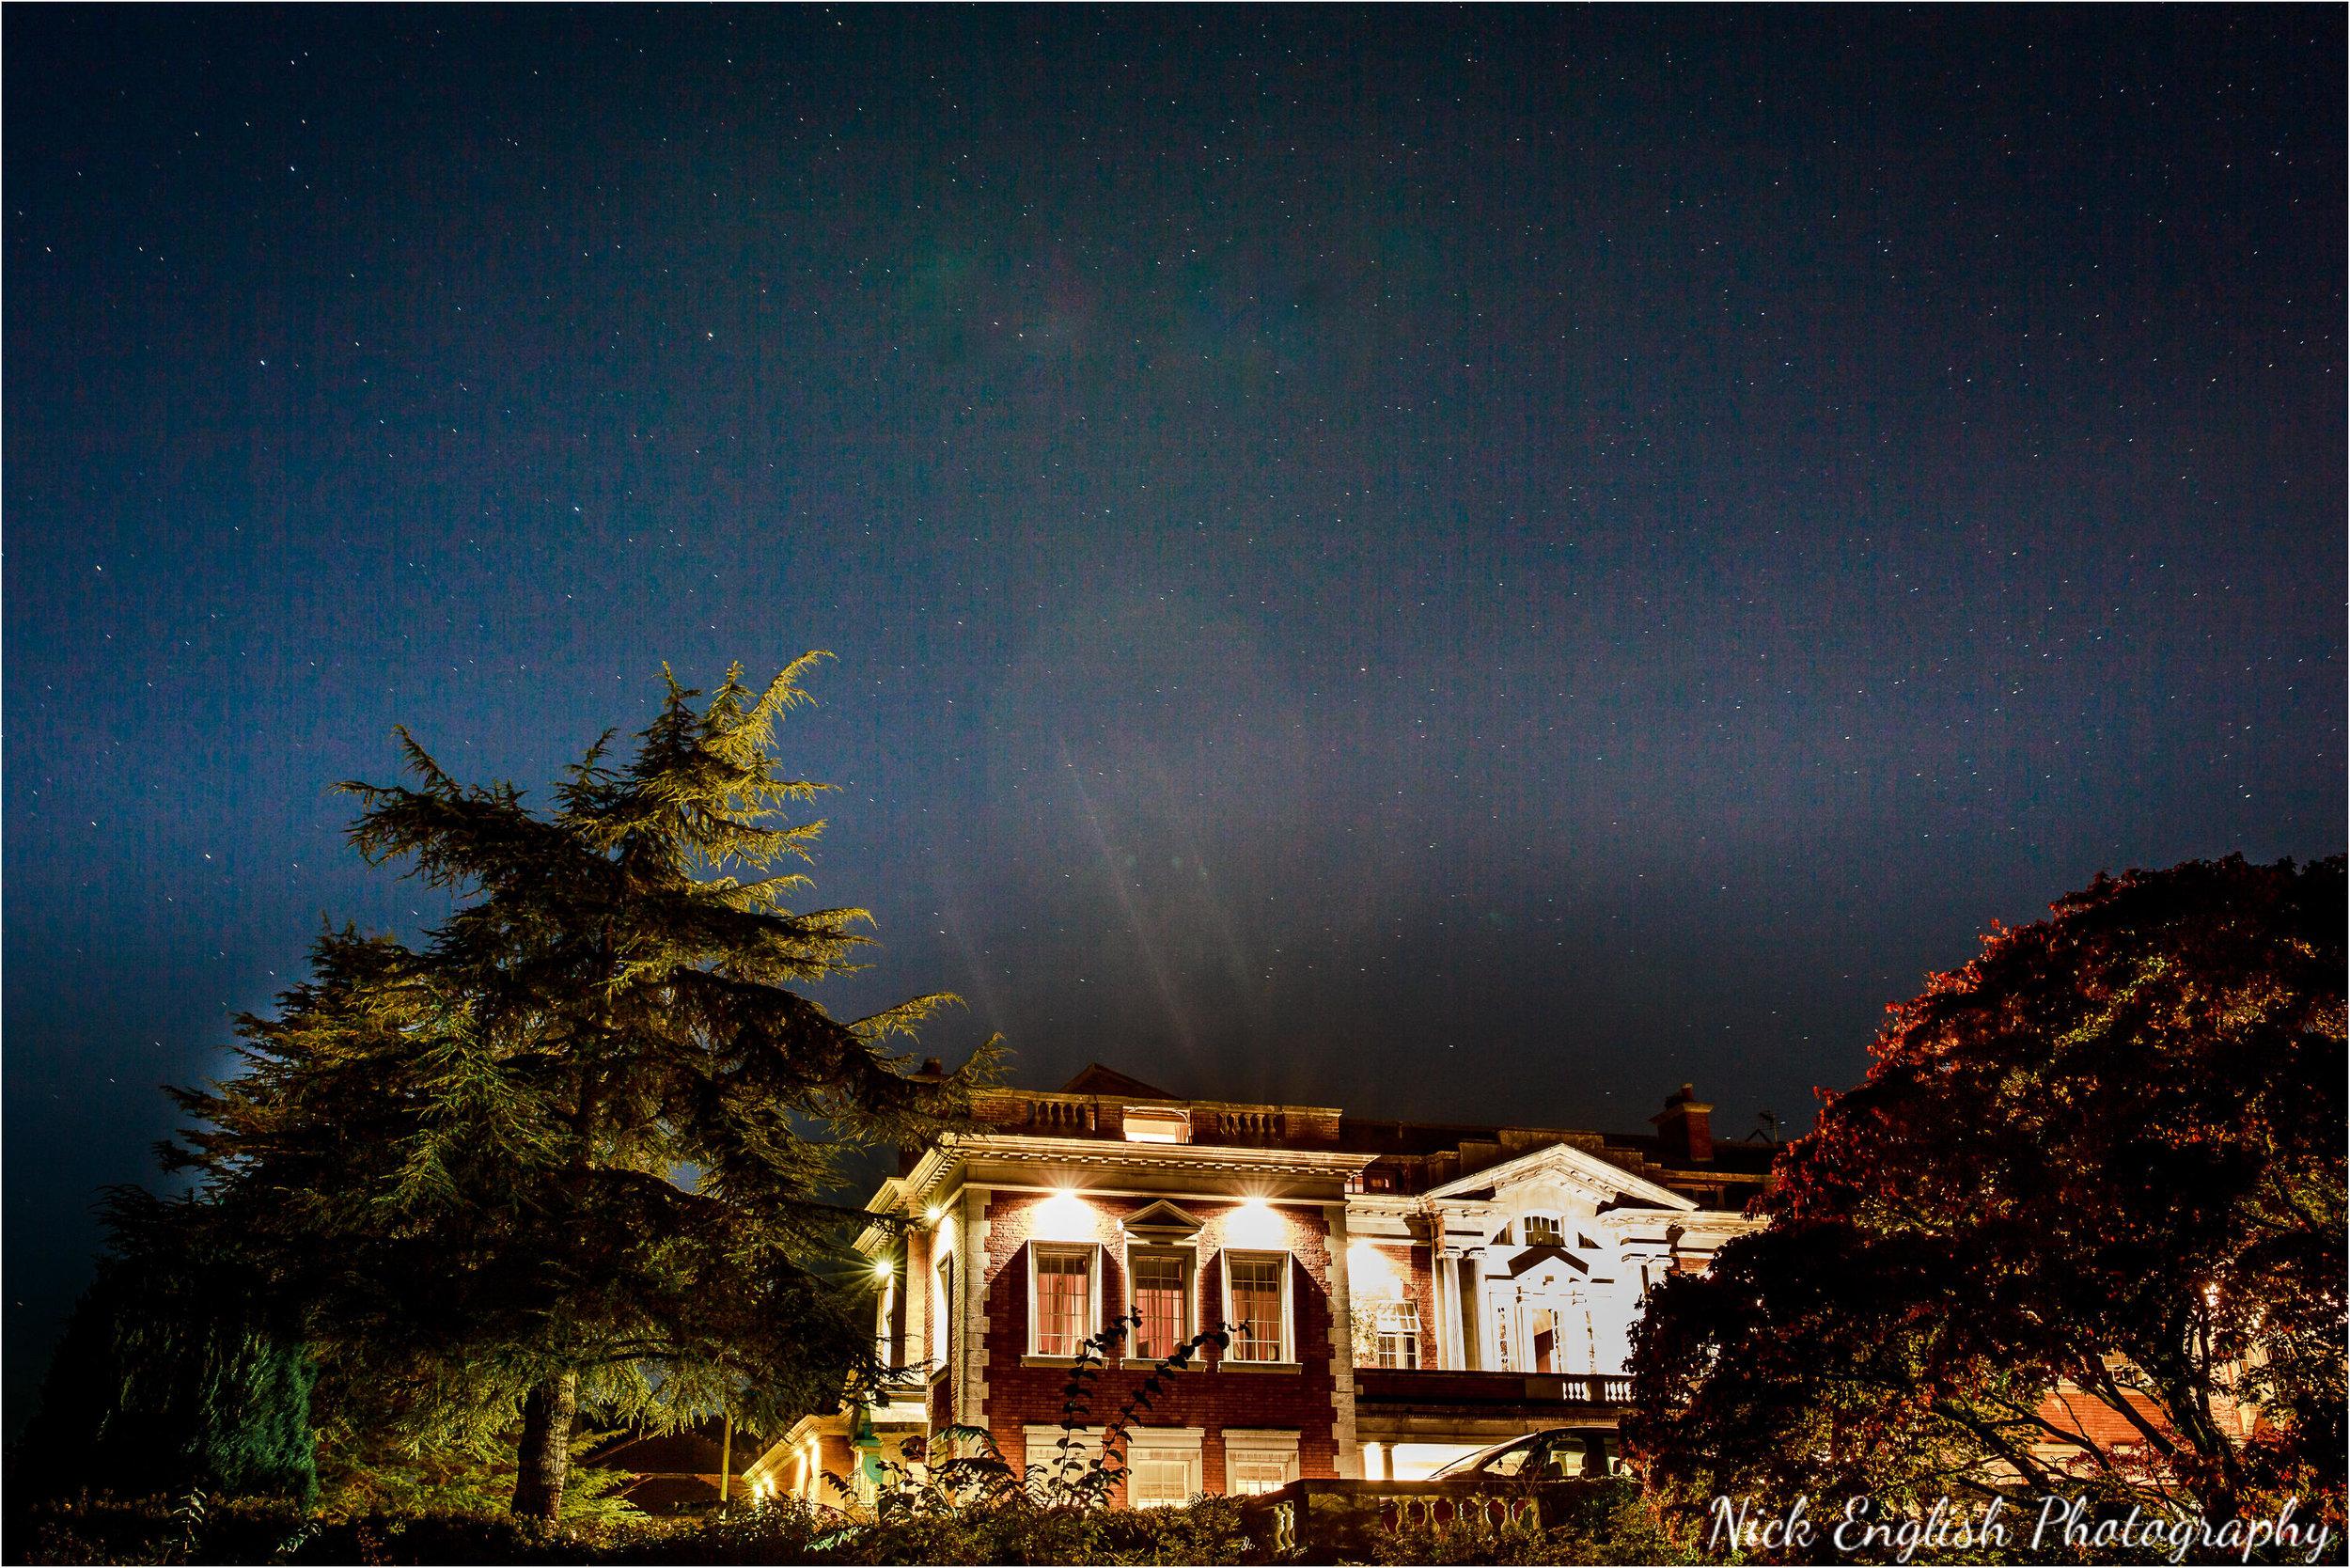 Eaves Hall Stars Sky Night Building Lit Up